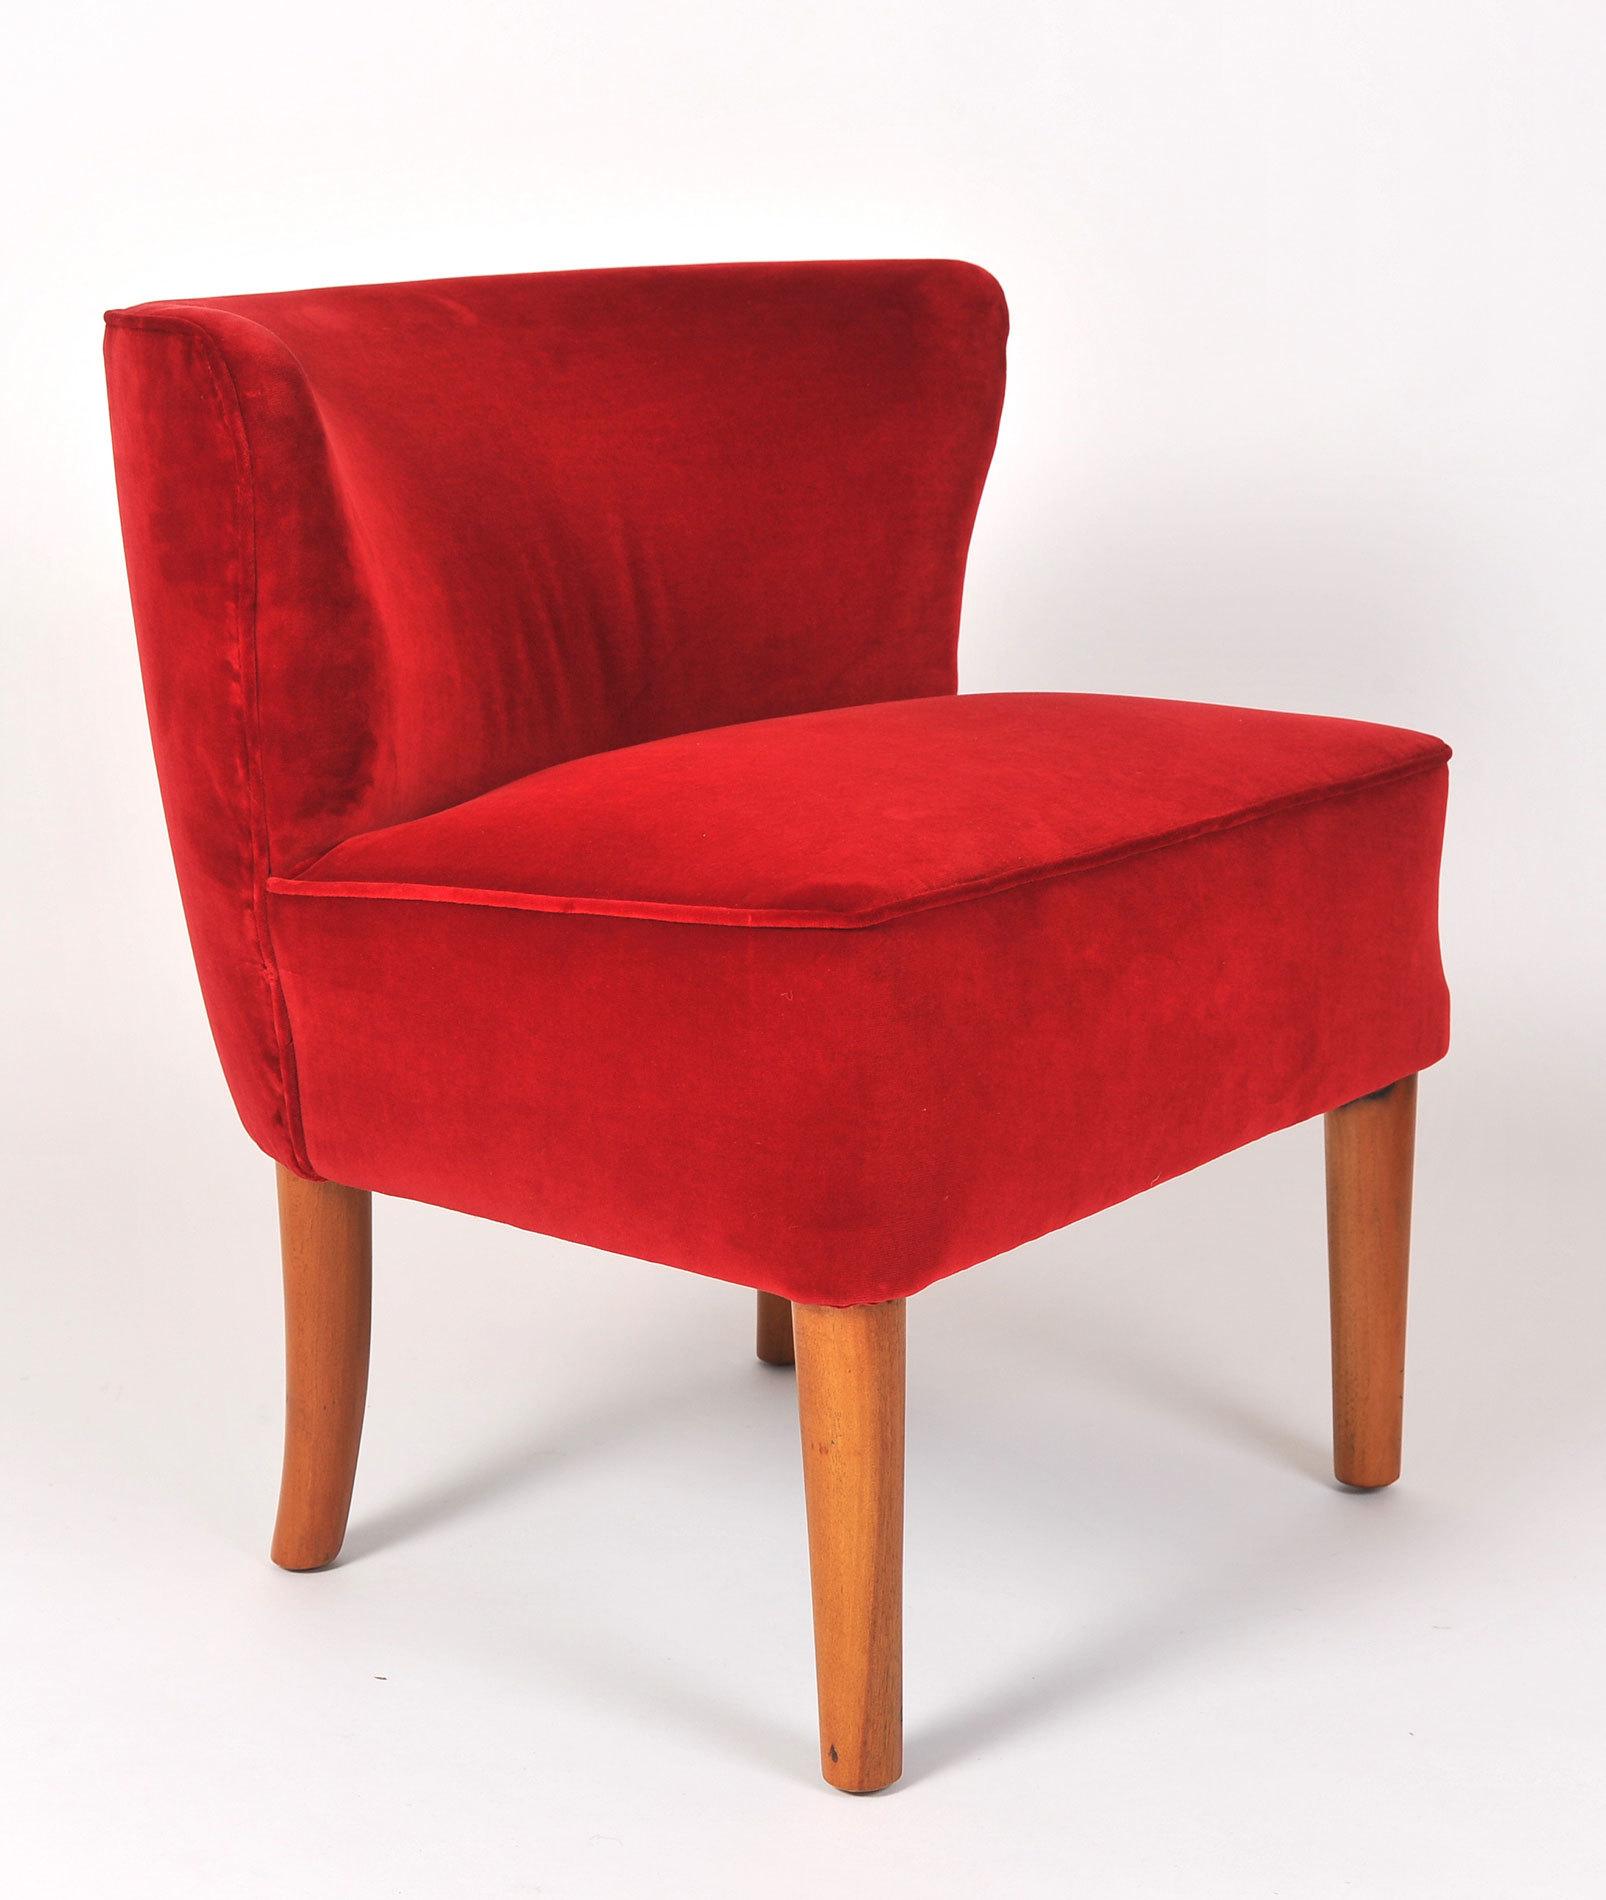 Pair Red Velvet Chairs 03